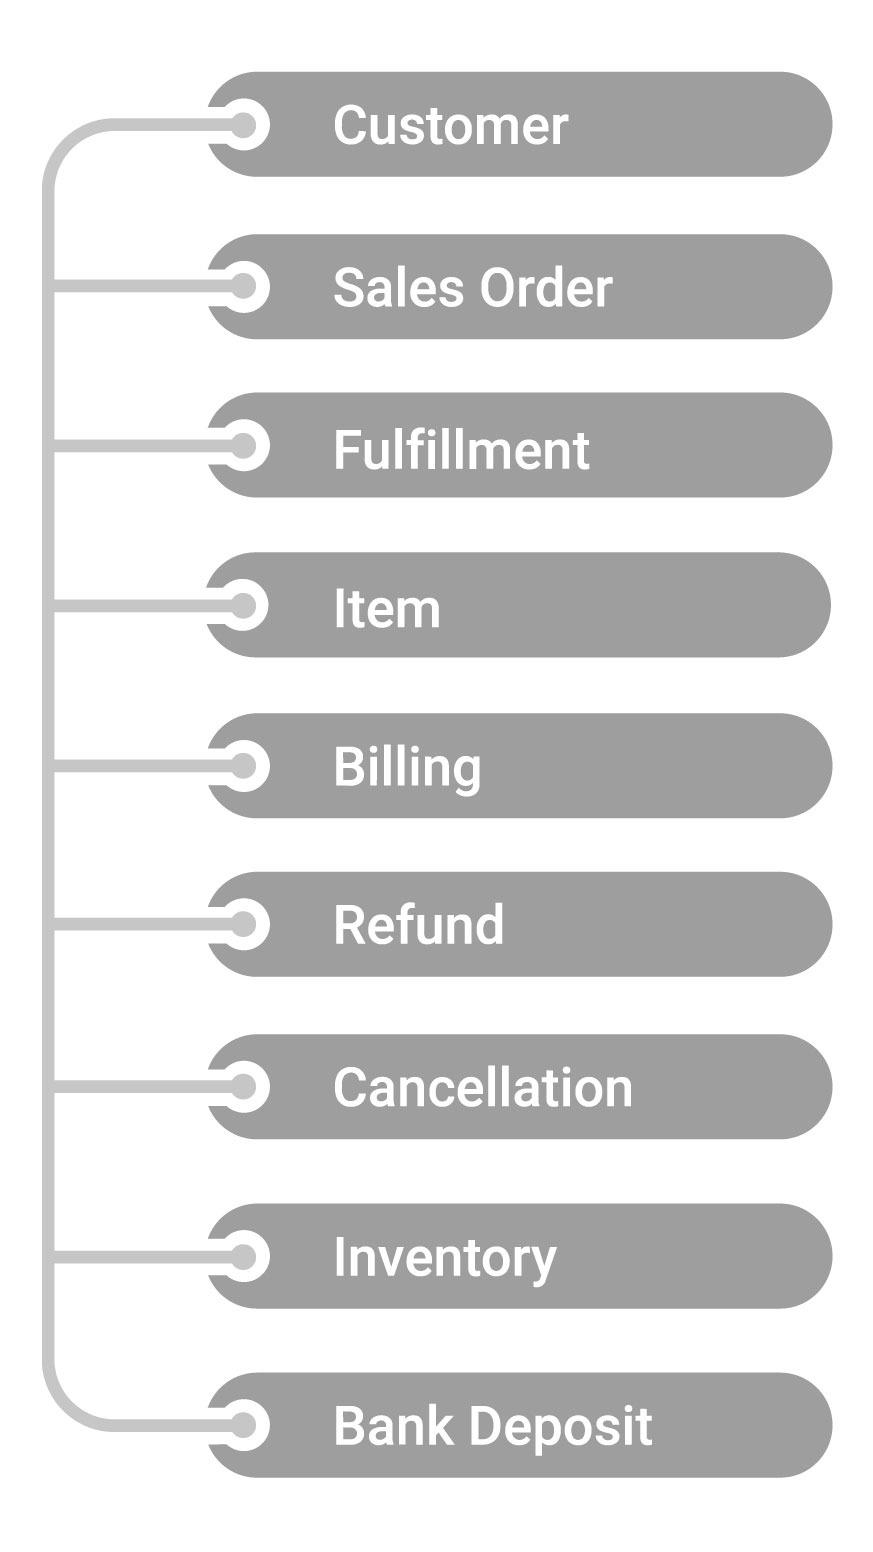 shopify netsuite integration services